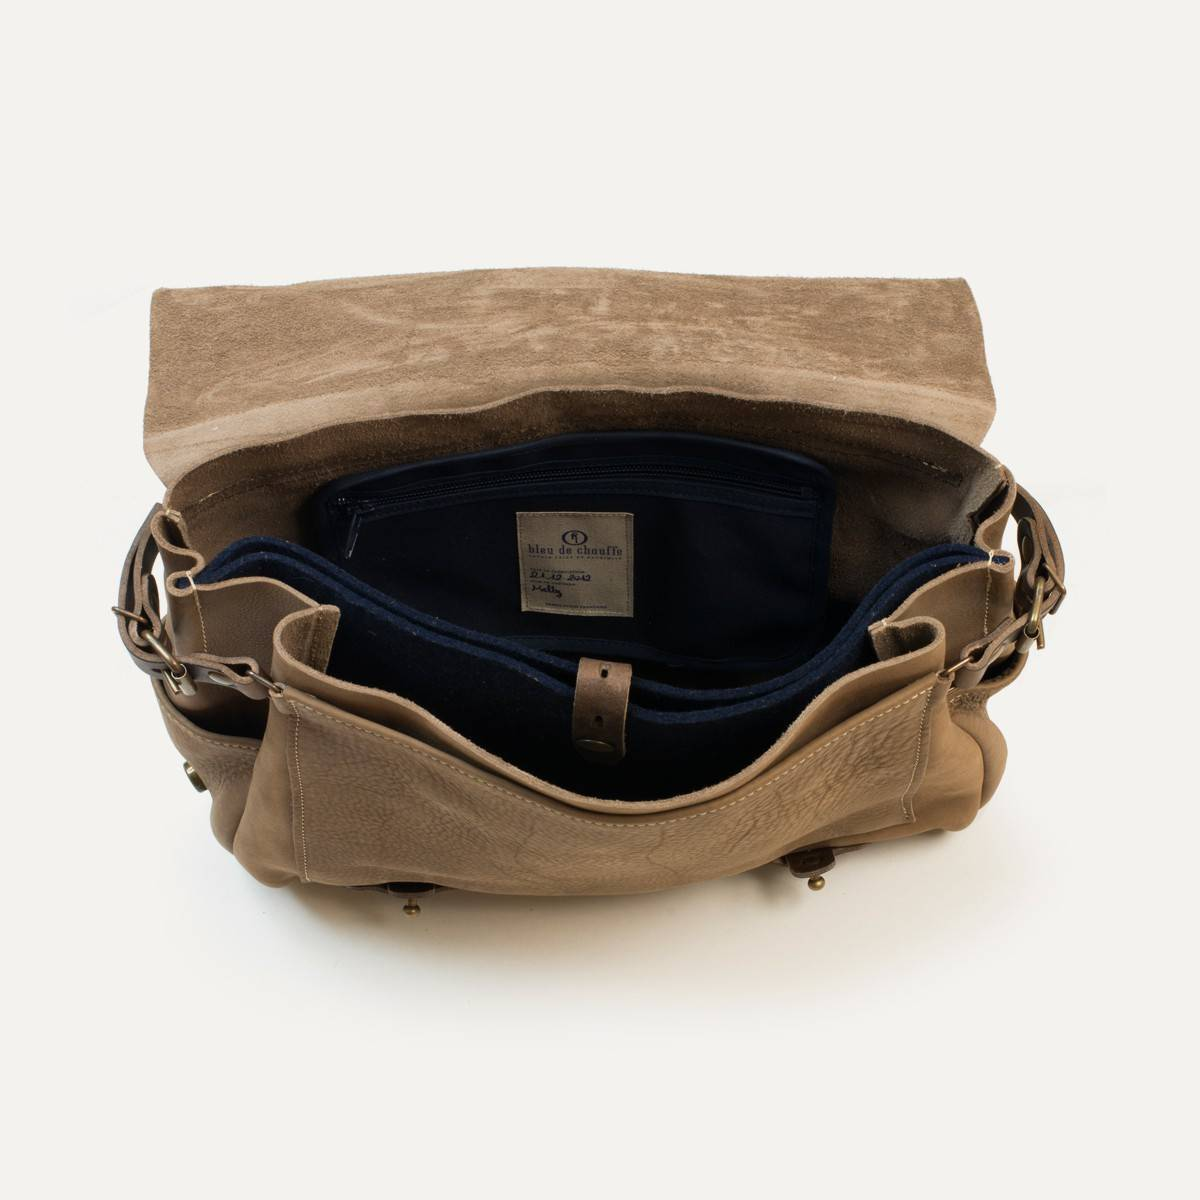 Postman bag Eclair - Taupe (image n°5)